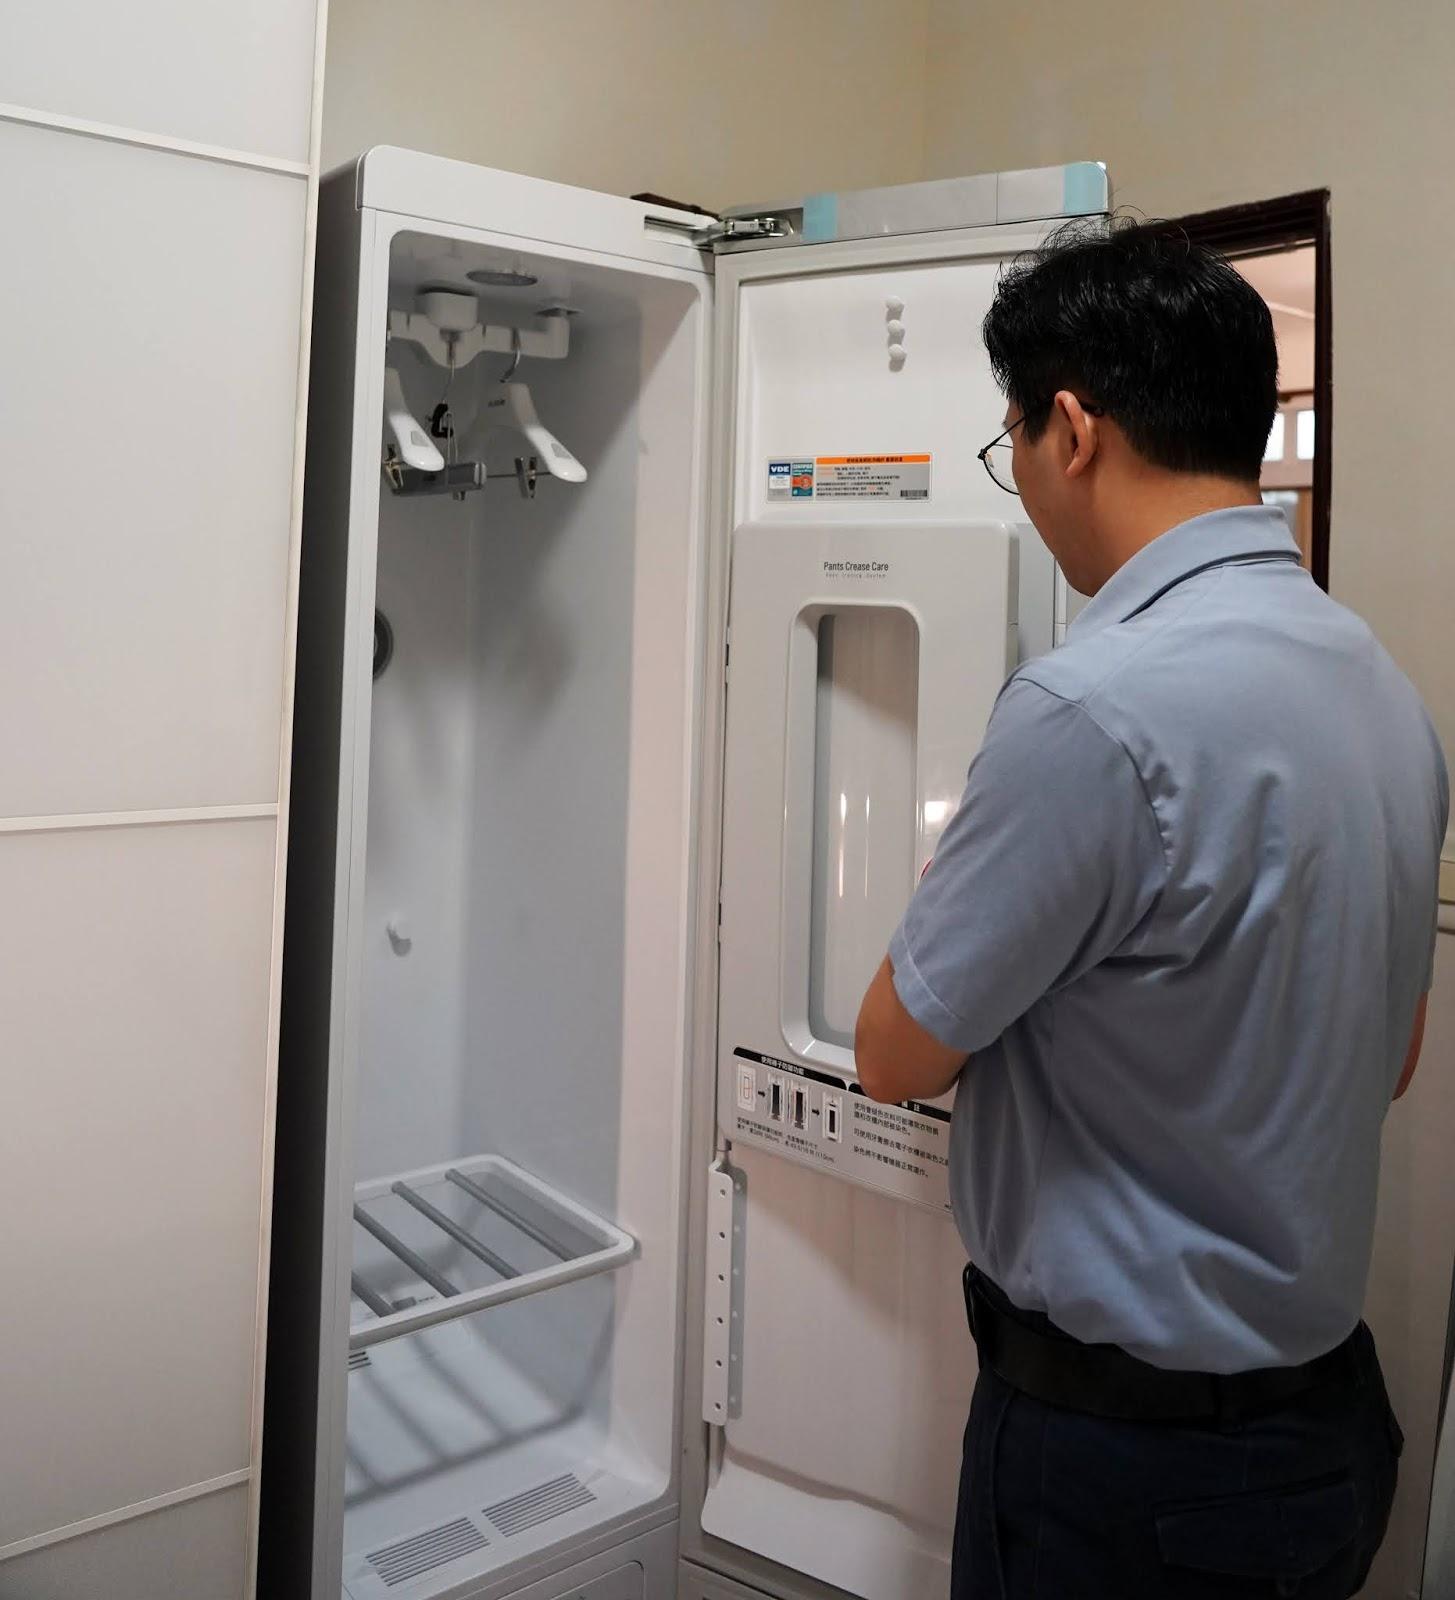 09_dj%25E7%2590%25A6%25E7%2590%25A6_wwwhostkikicom_LG.JPG-忙碌爸媽的救星,智慧電子衣櫥讓你輕鬆進行衣物清潔殺菌